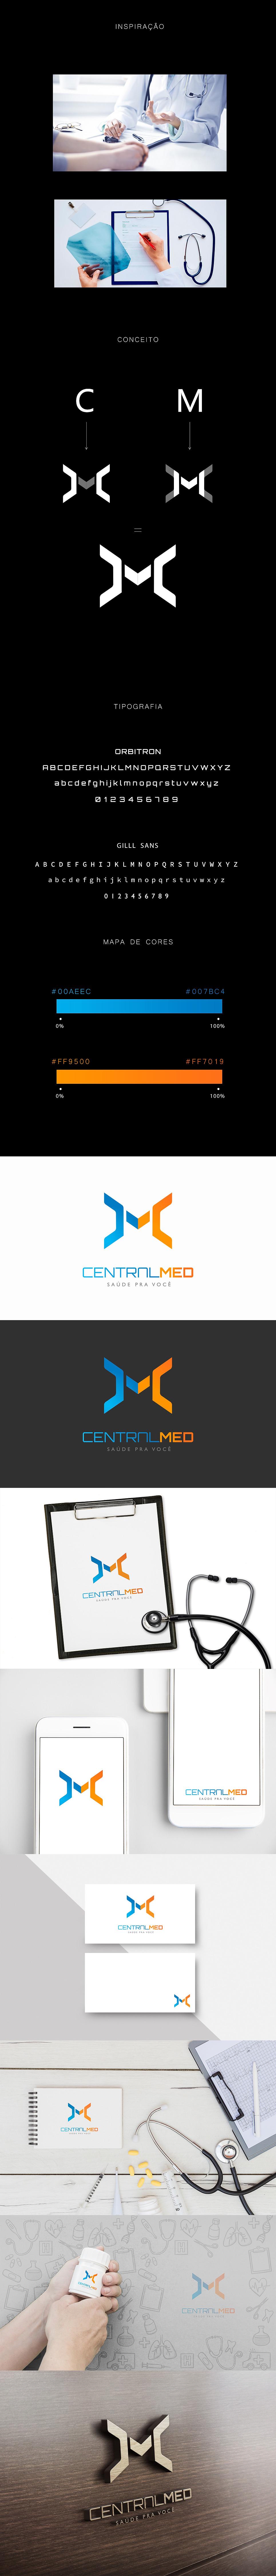 Central Med apresentação.jpg